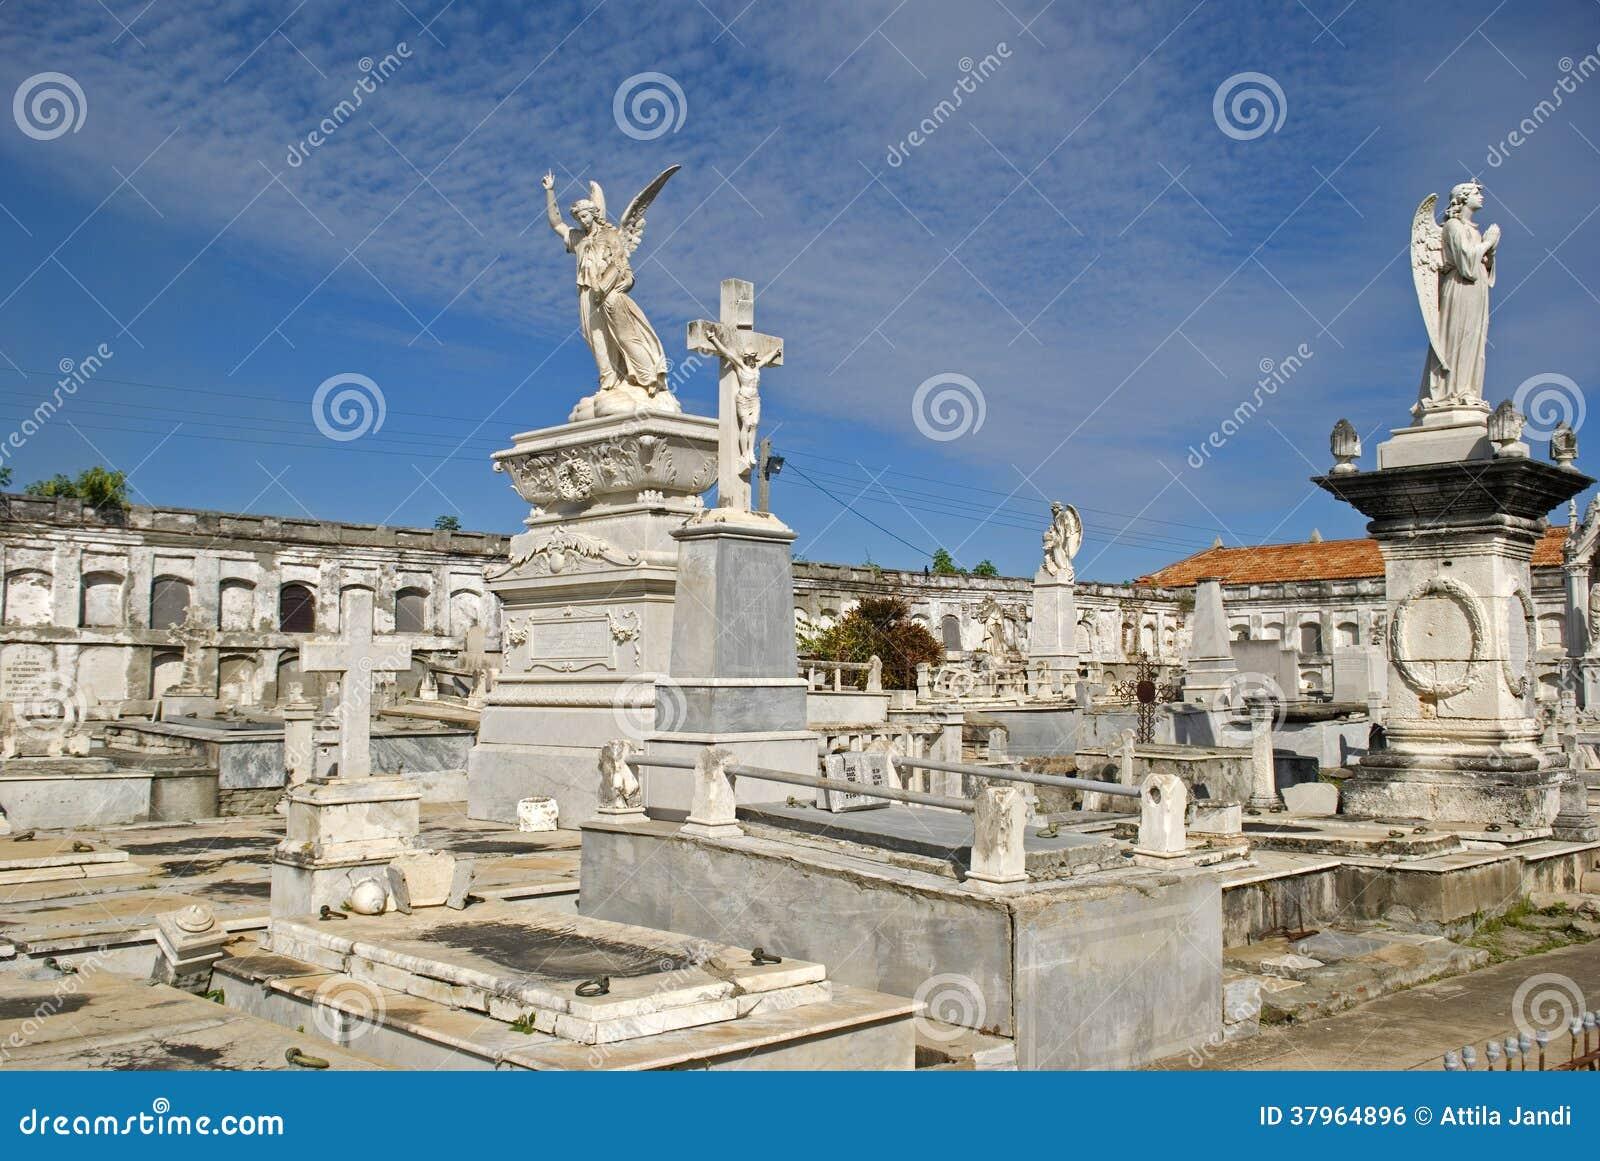 Reina Cemetery, Cienfuegos, Cuba